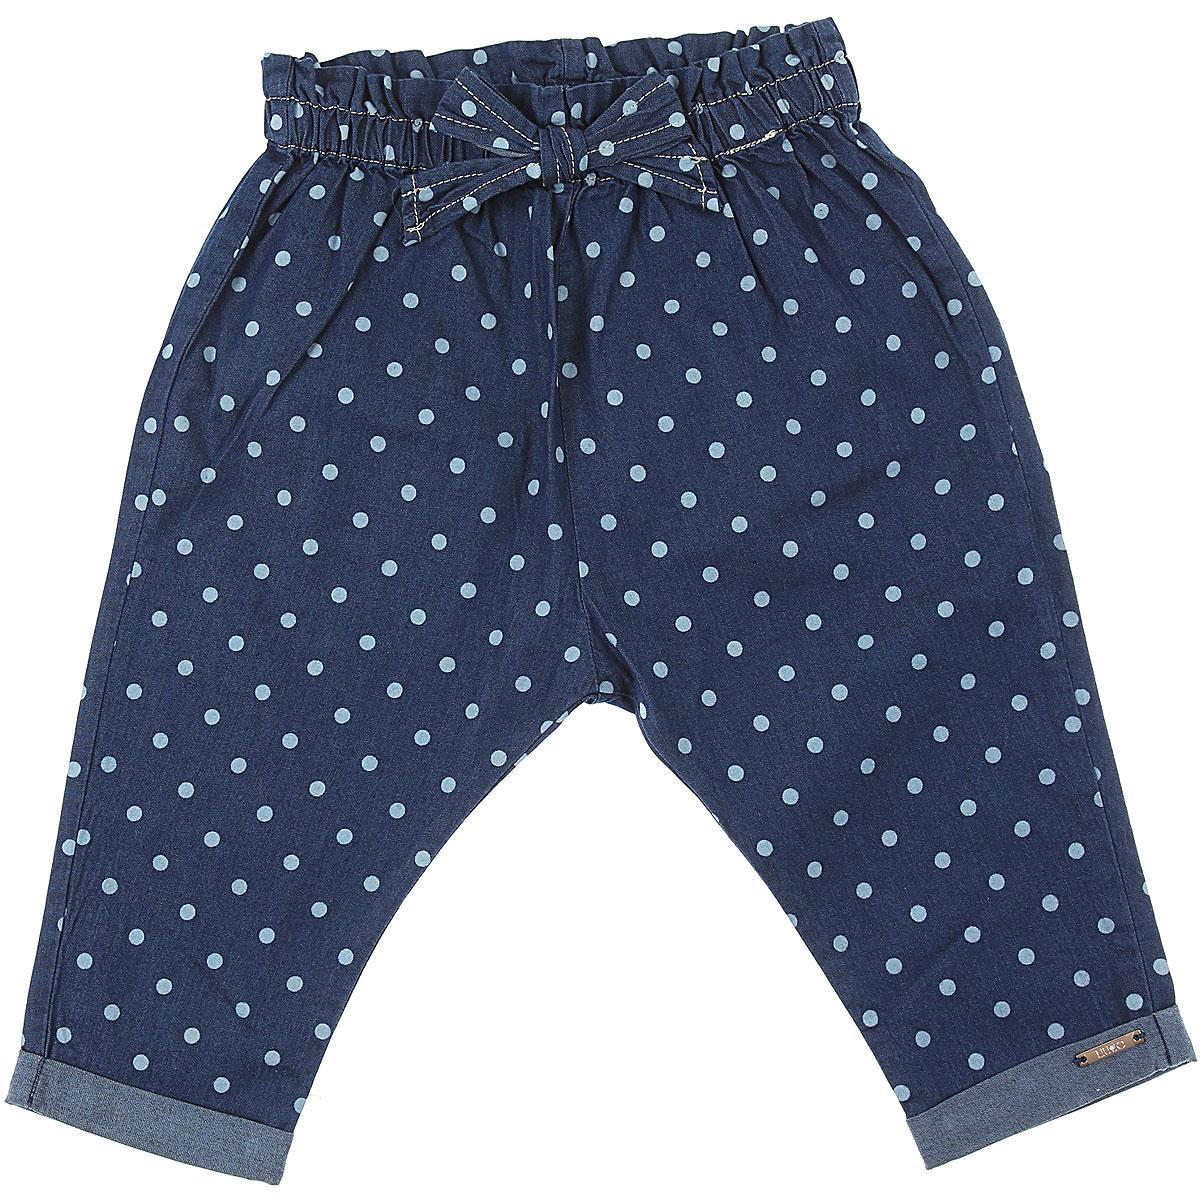 Liu Jo Baby Pants for Girls On Sale, Blue Denim, Cotton, 2019, 12M 18M 3M